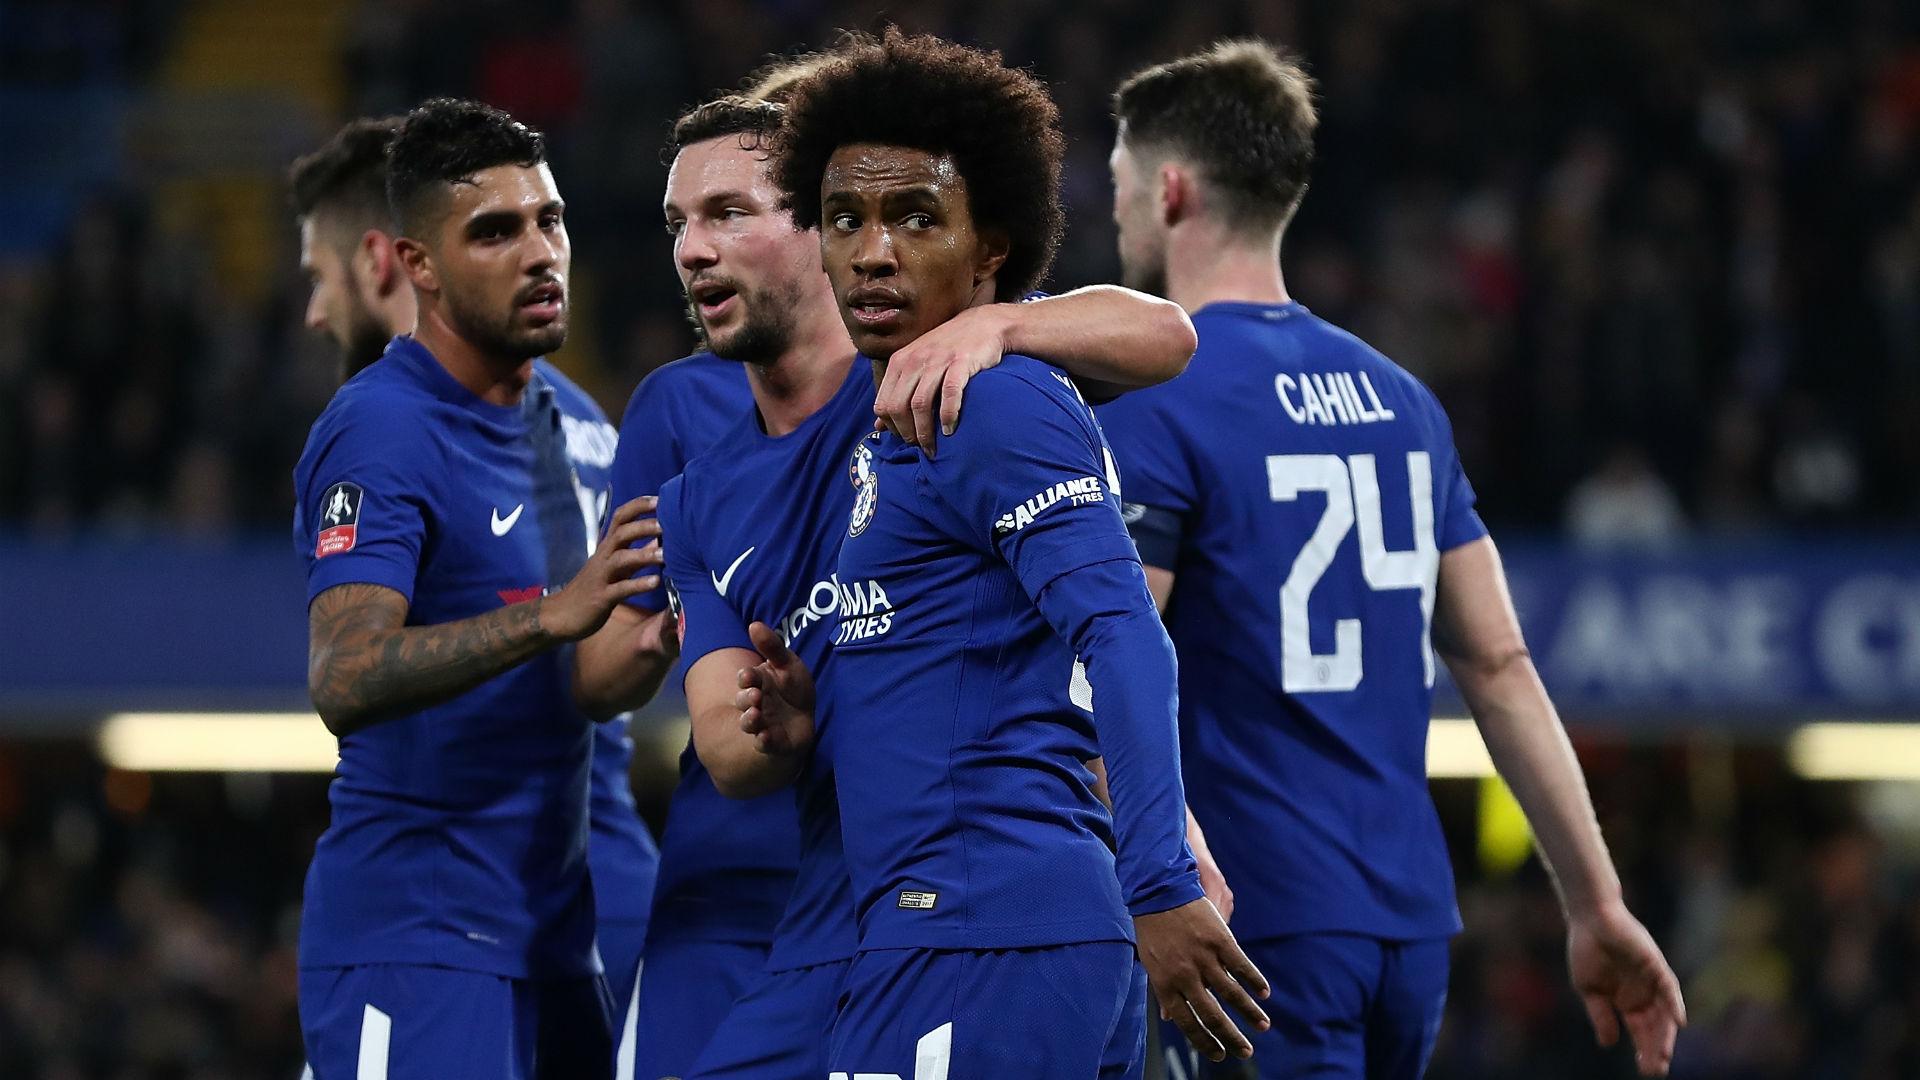 Antonio Conte hints at change of formation as struggles continue